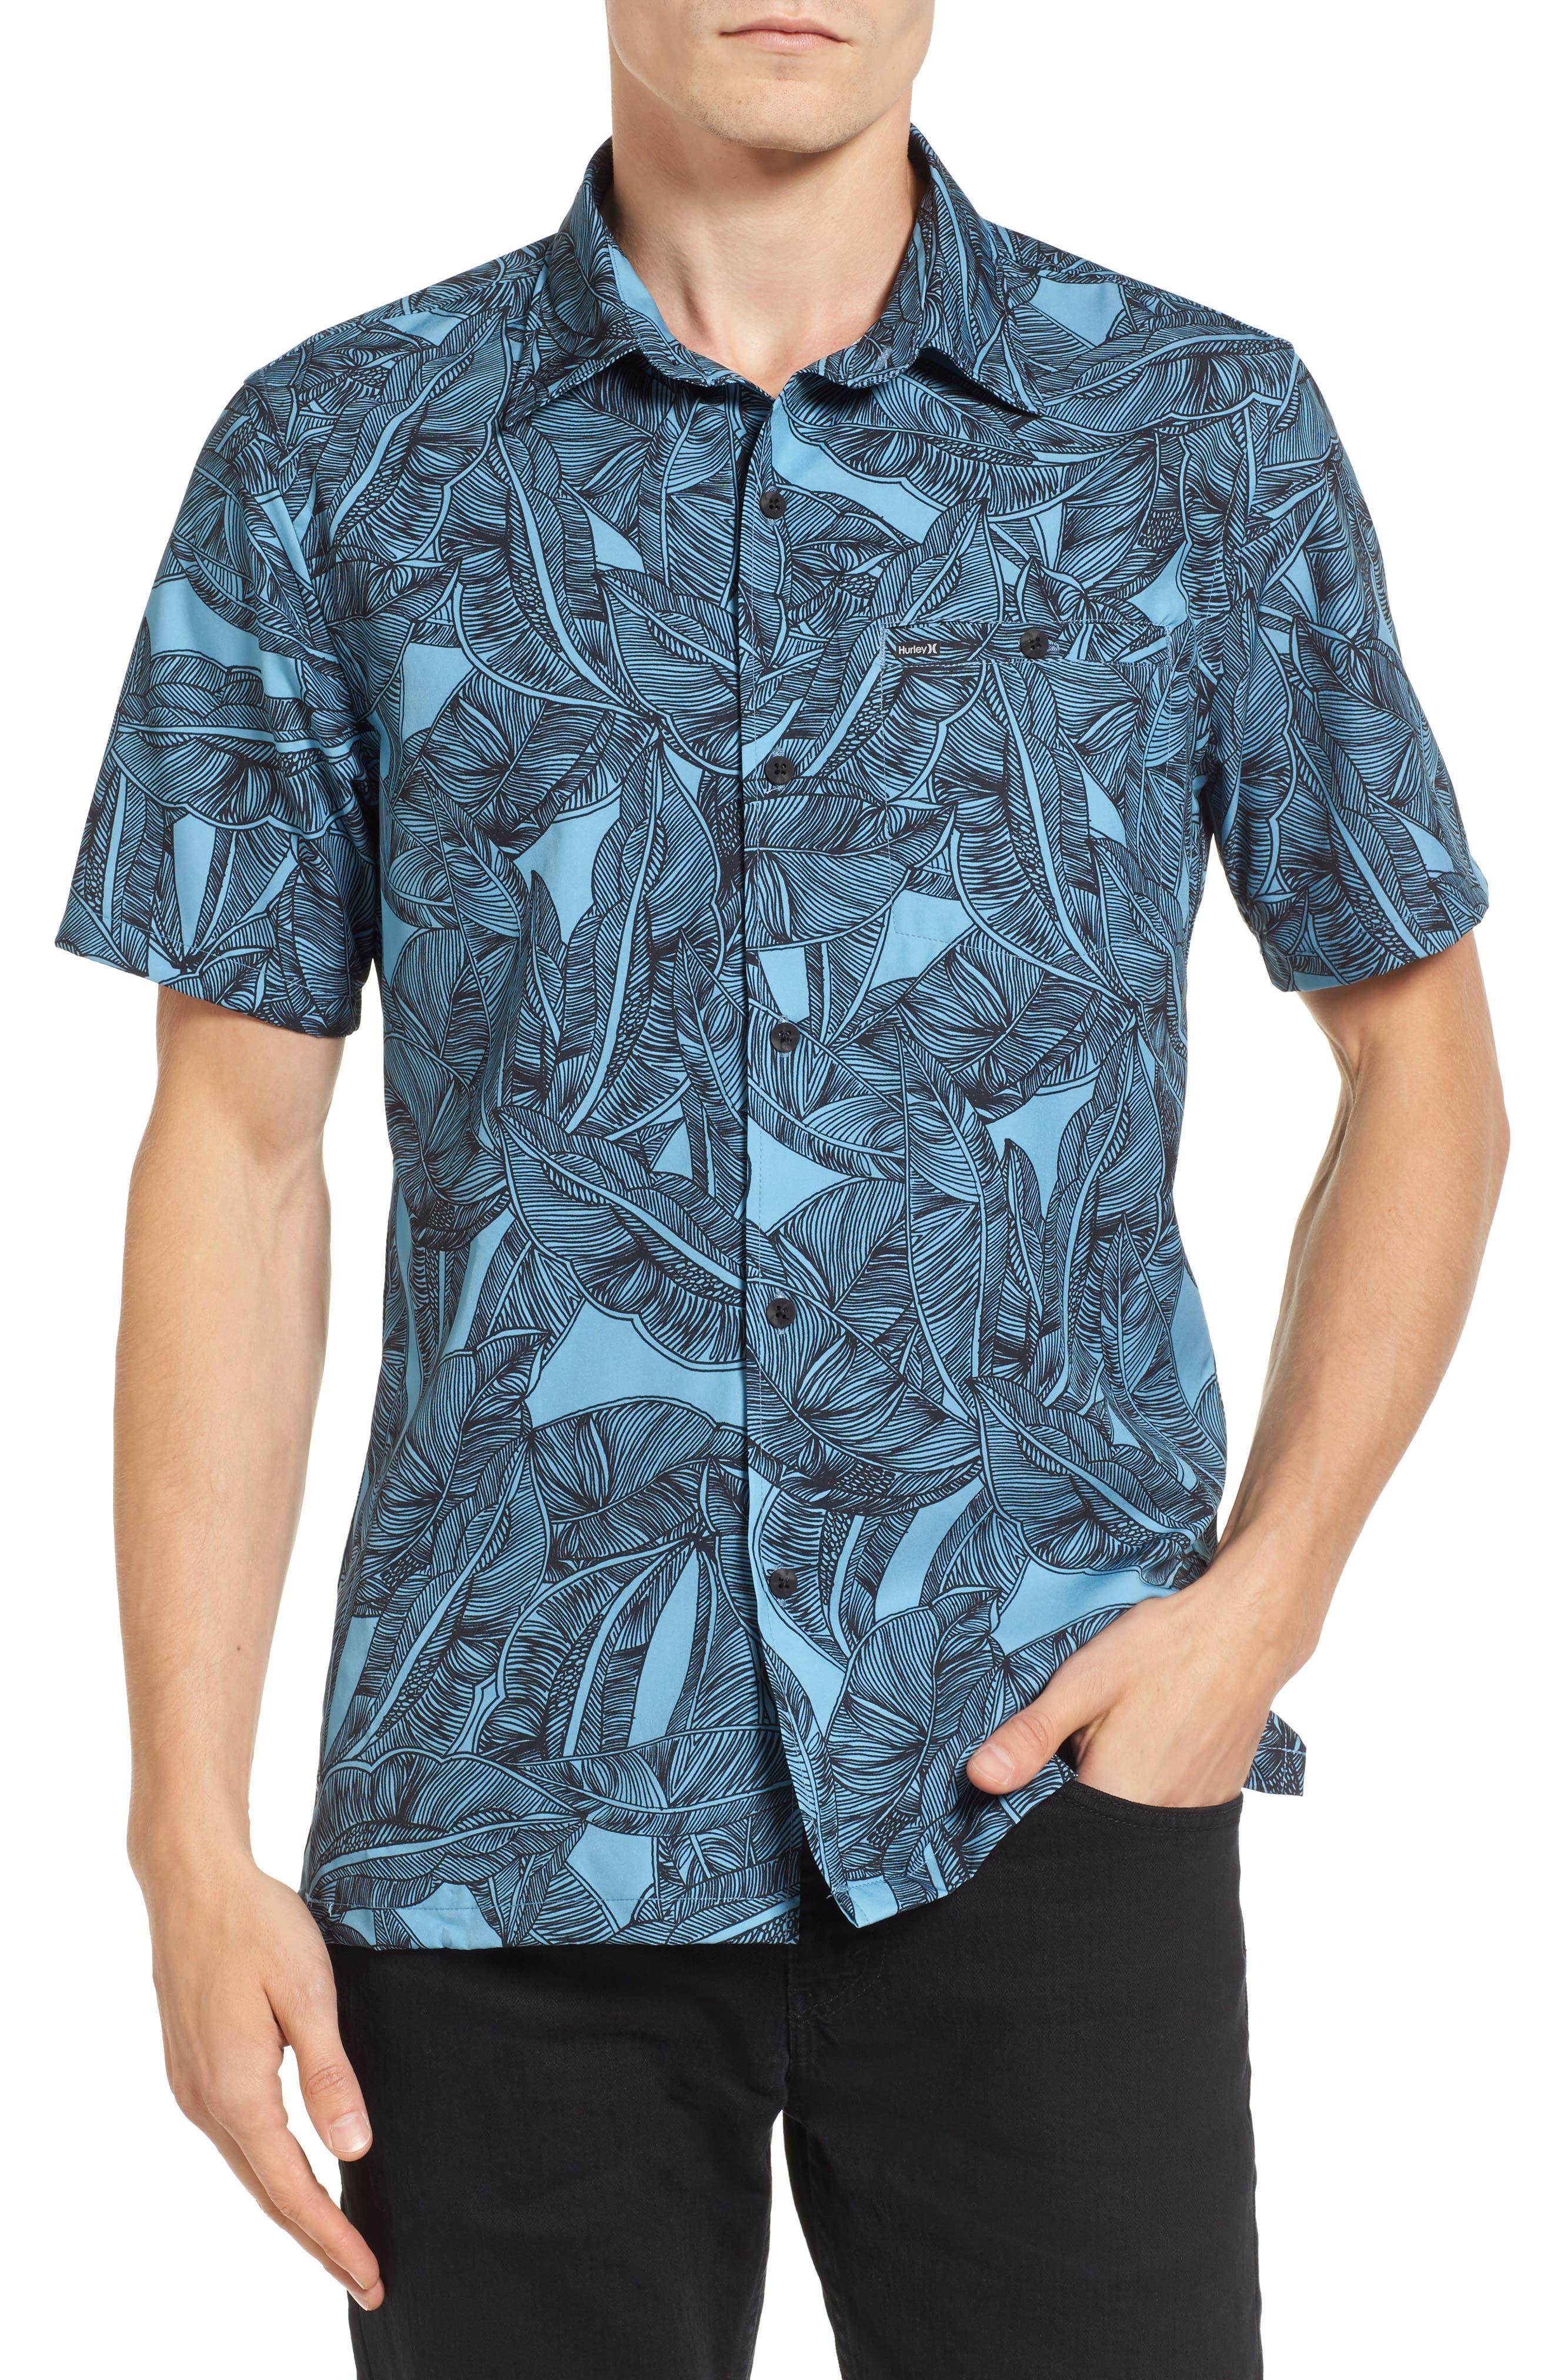 Main Image - Hurley Lush Woven Shirt